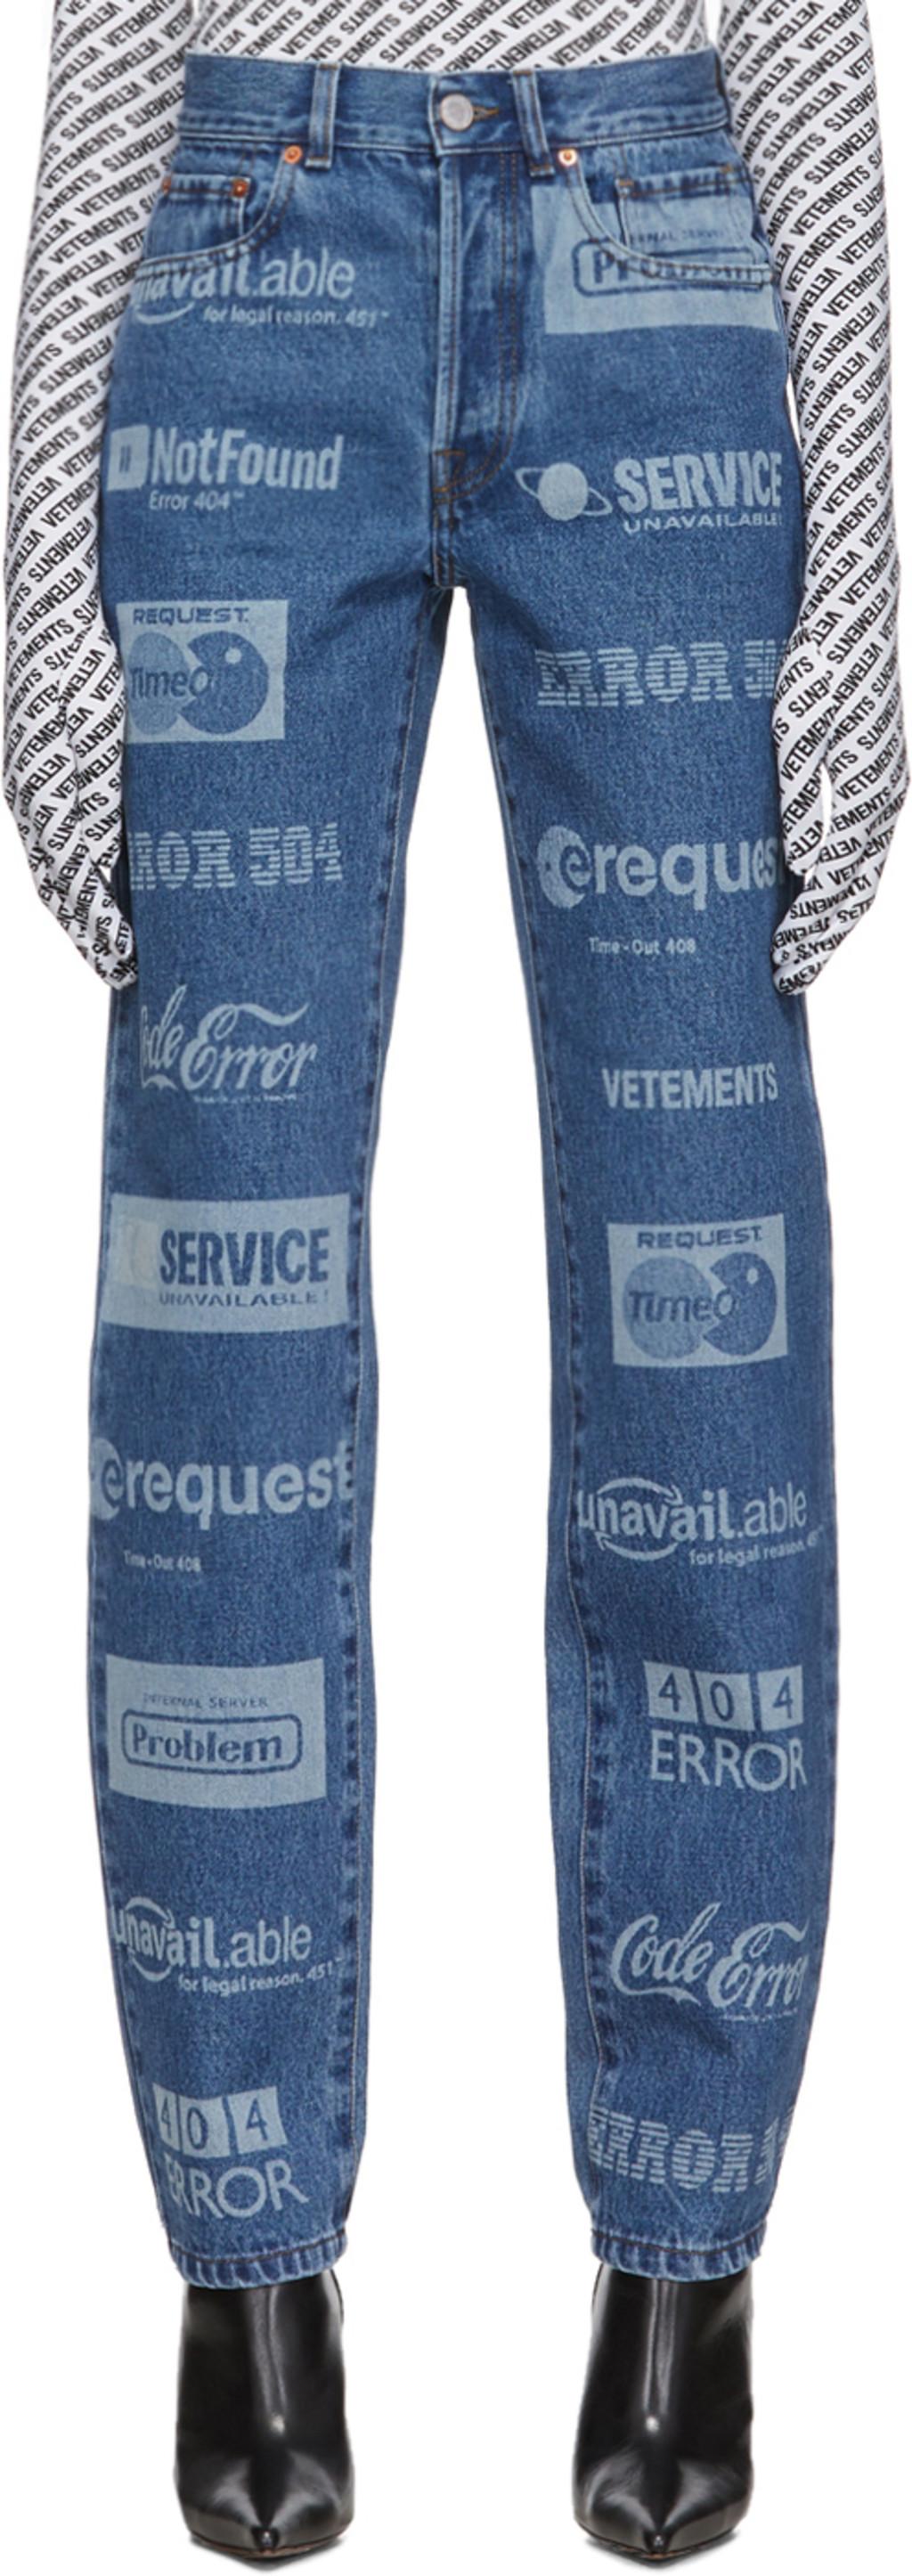 c4c3aae9 Blue Fully Branded Jeans